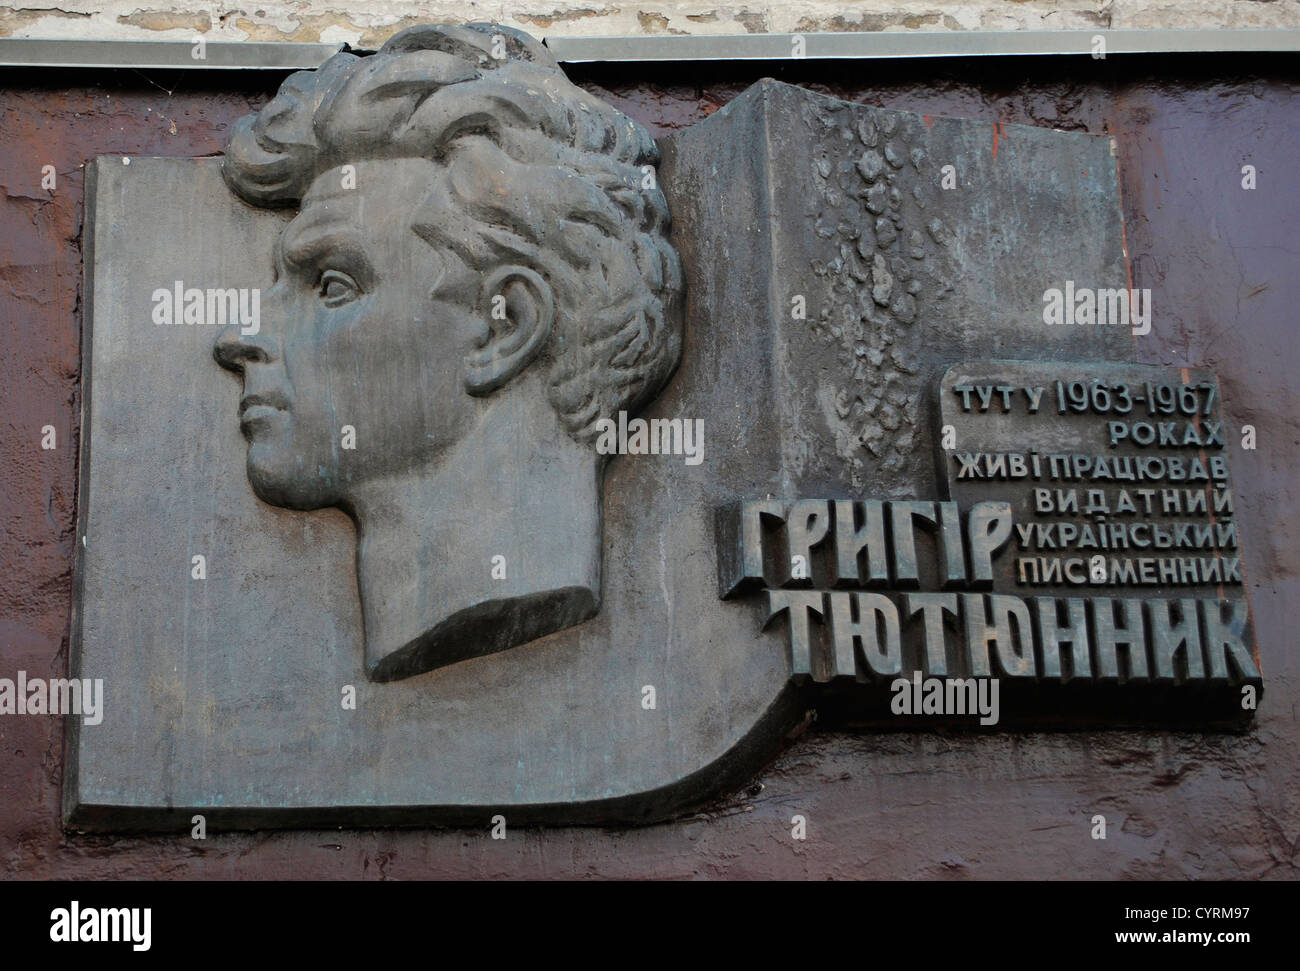 Hryhir Tiutiunnyk (1931-1980). Ukrainian writer. Memorial plaque. Home where he lived from 1963-1967. Kiev. Ukraine. - Stock Image